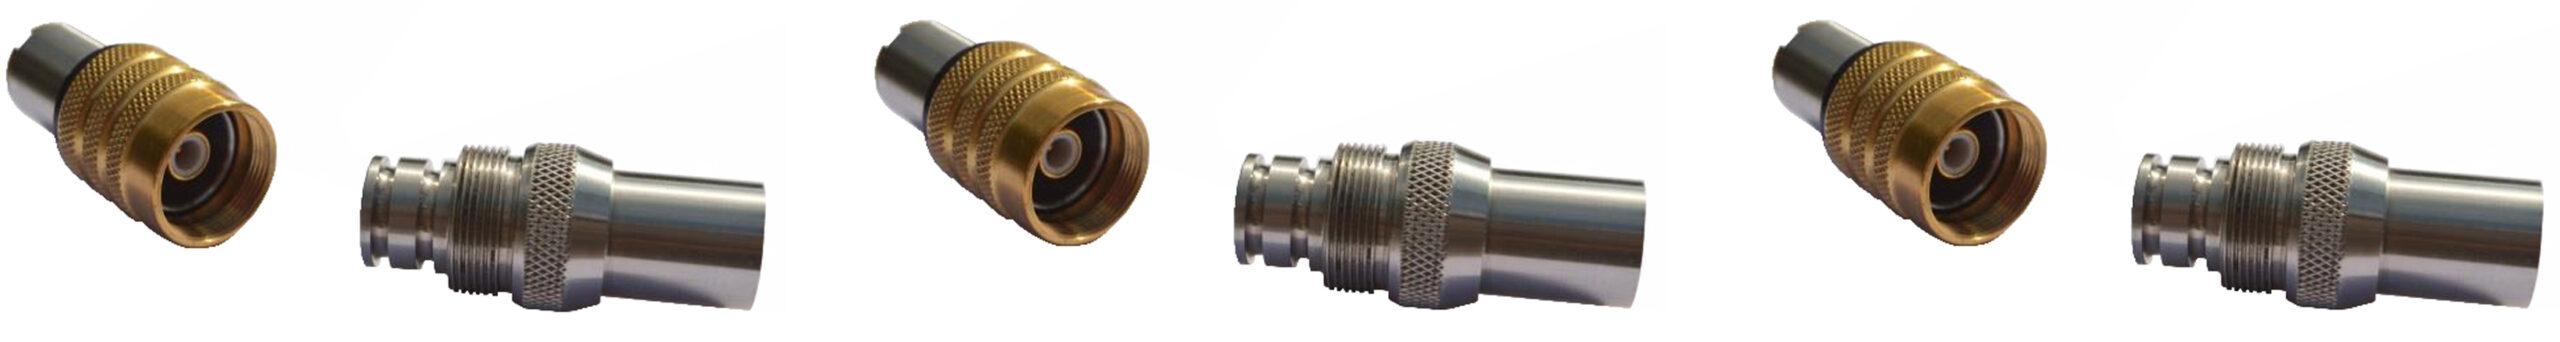 Subsea coaxial connectors